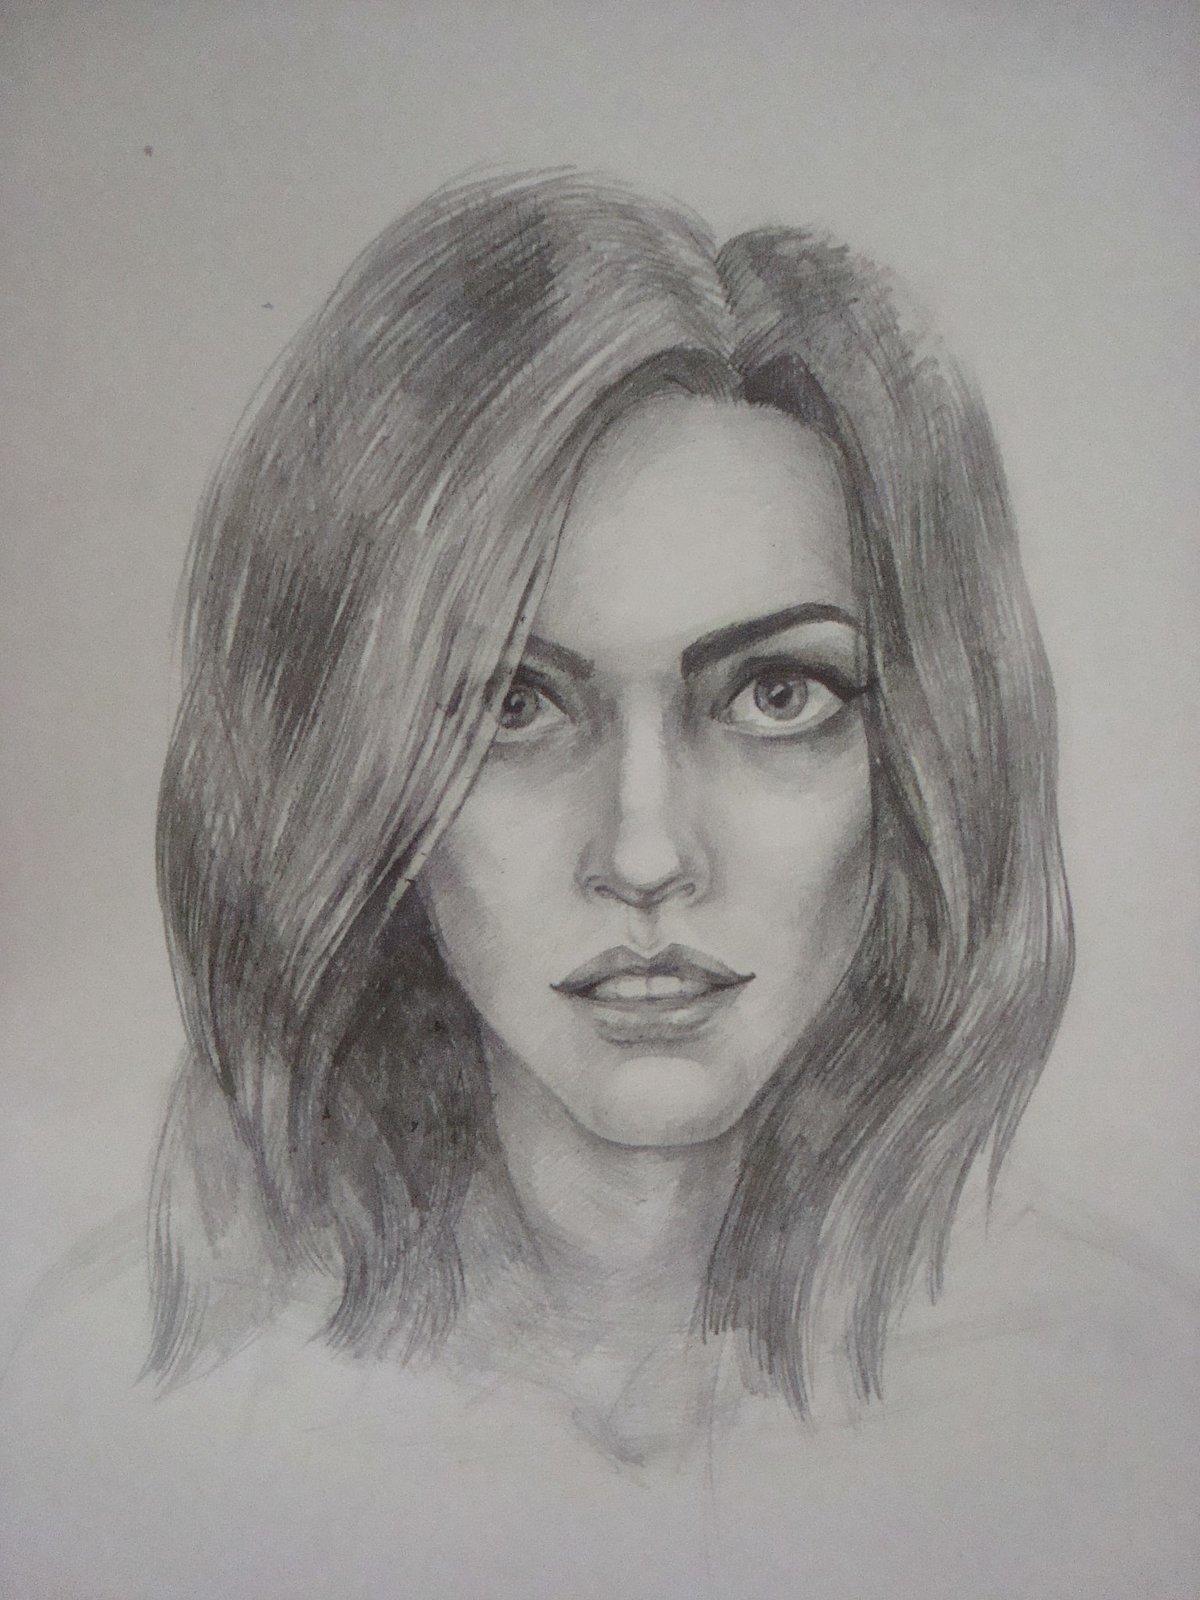 Картинки человека нарисованный карандашом